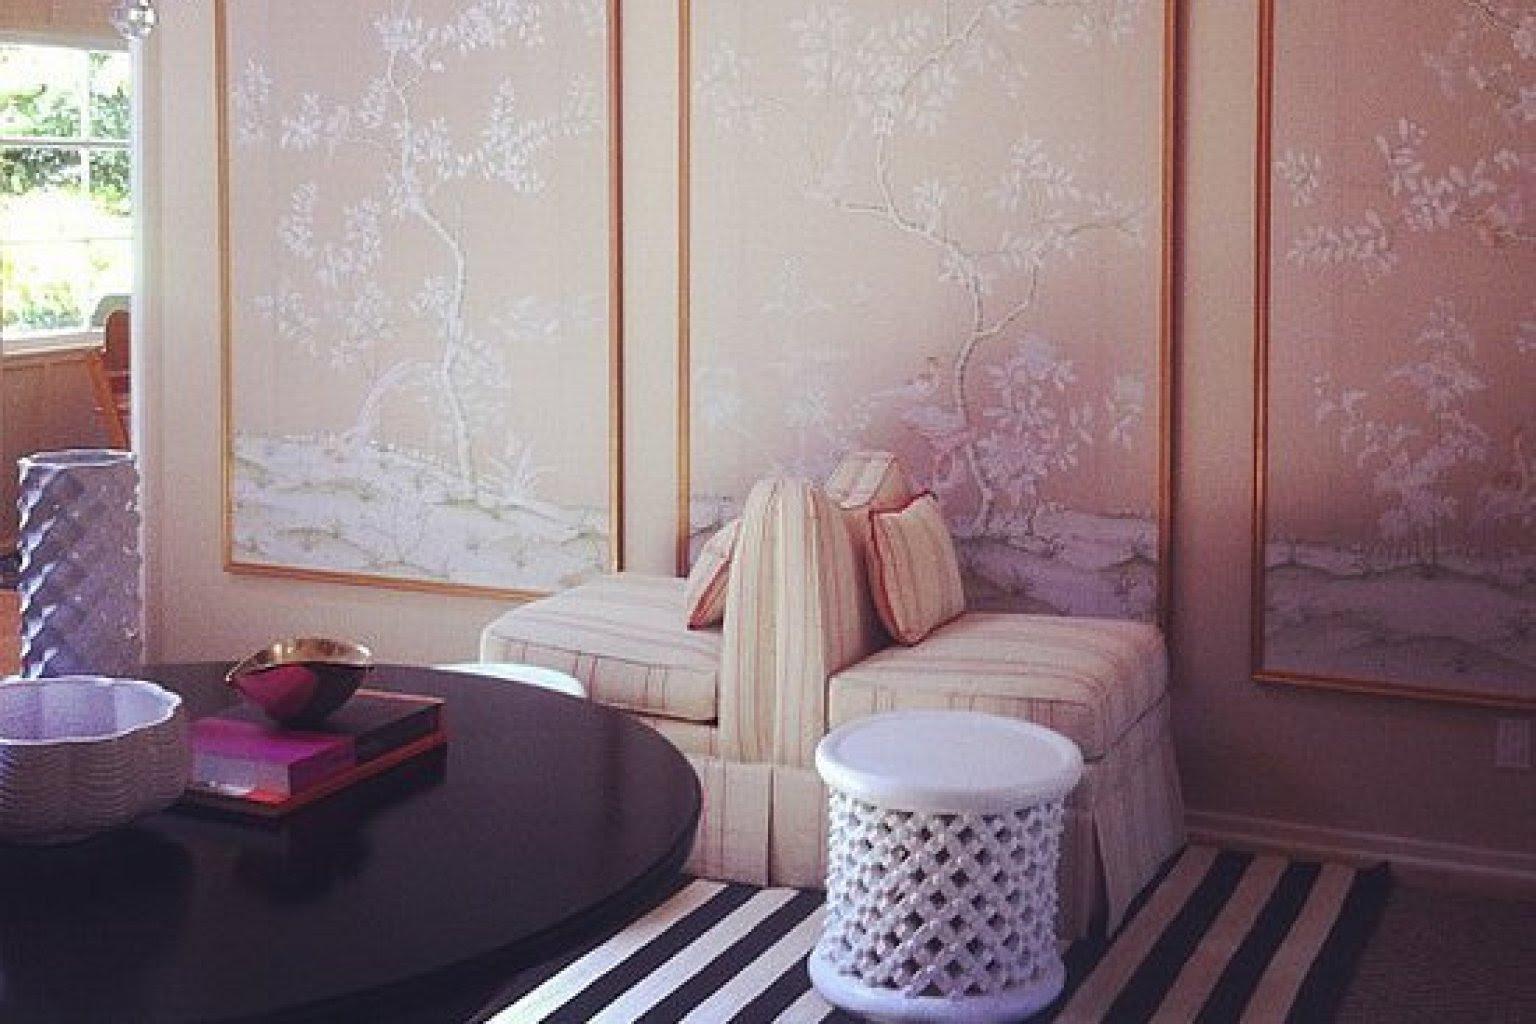 Top 16 Benefits of Hiring an Interior Designer or ...